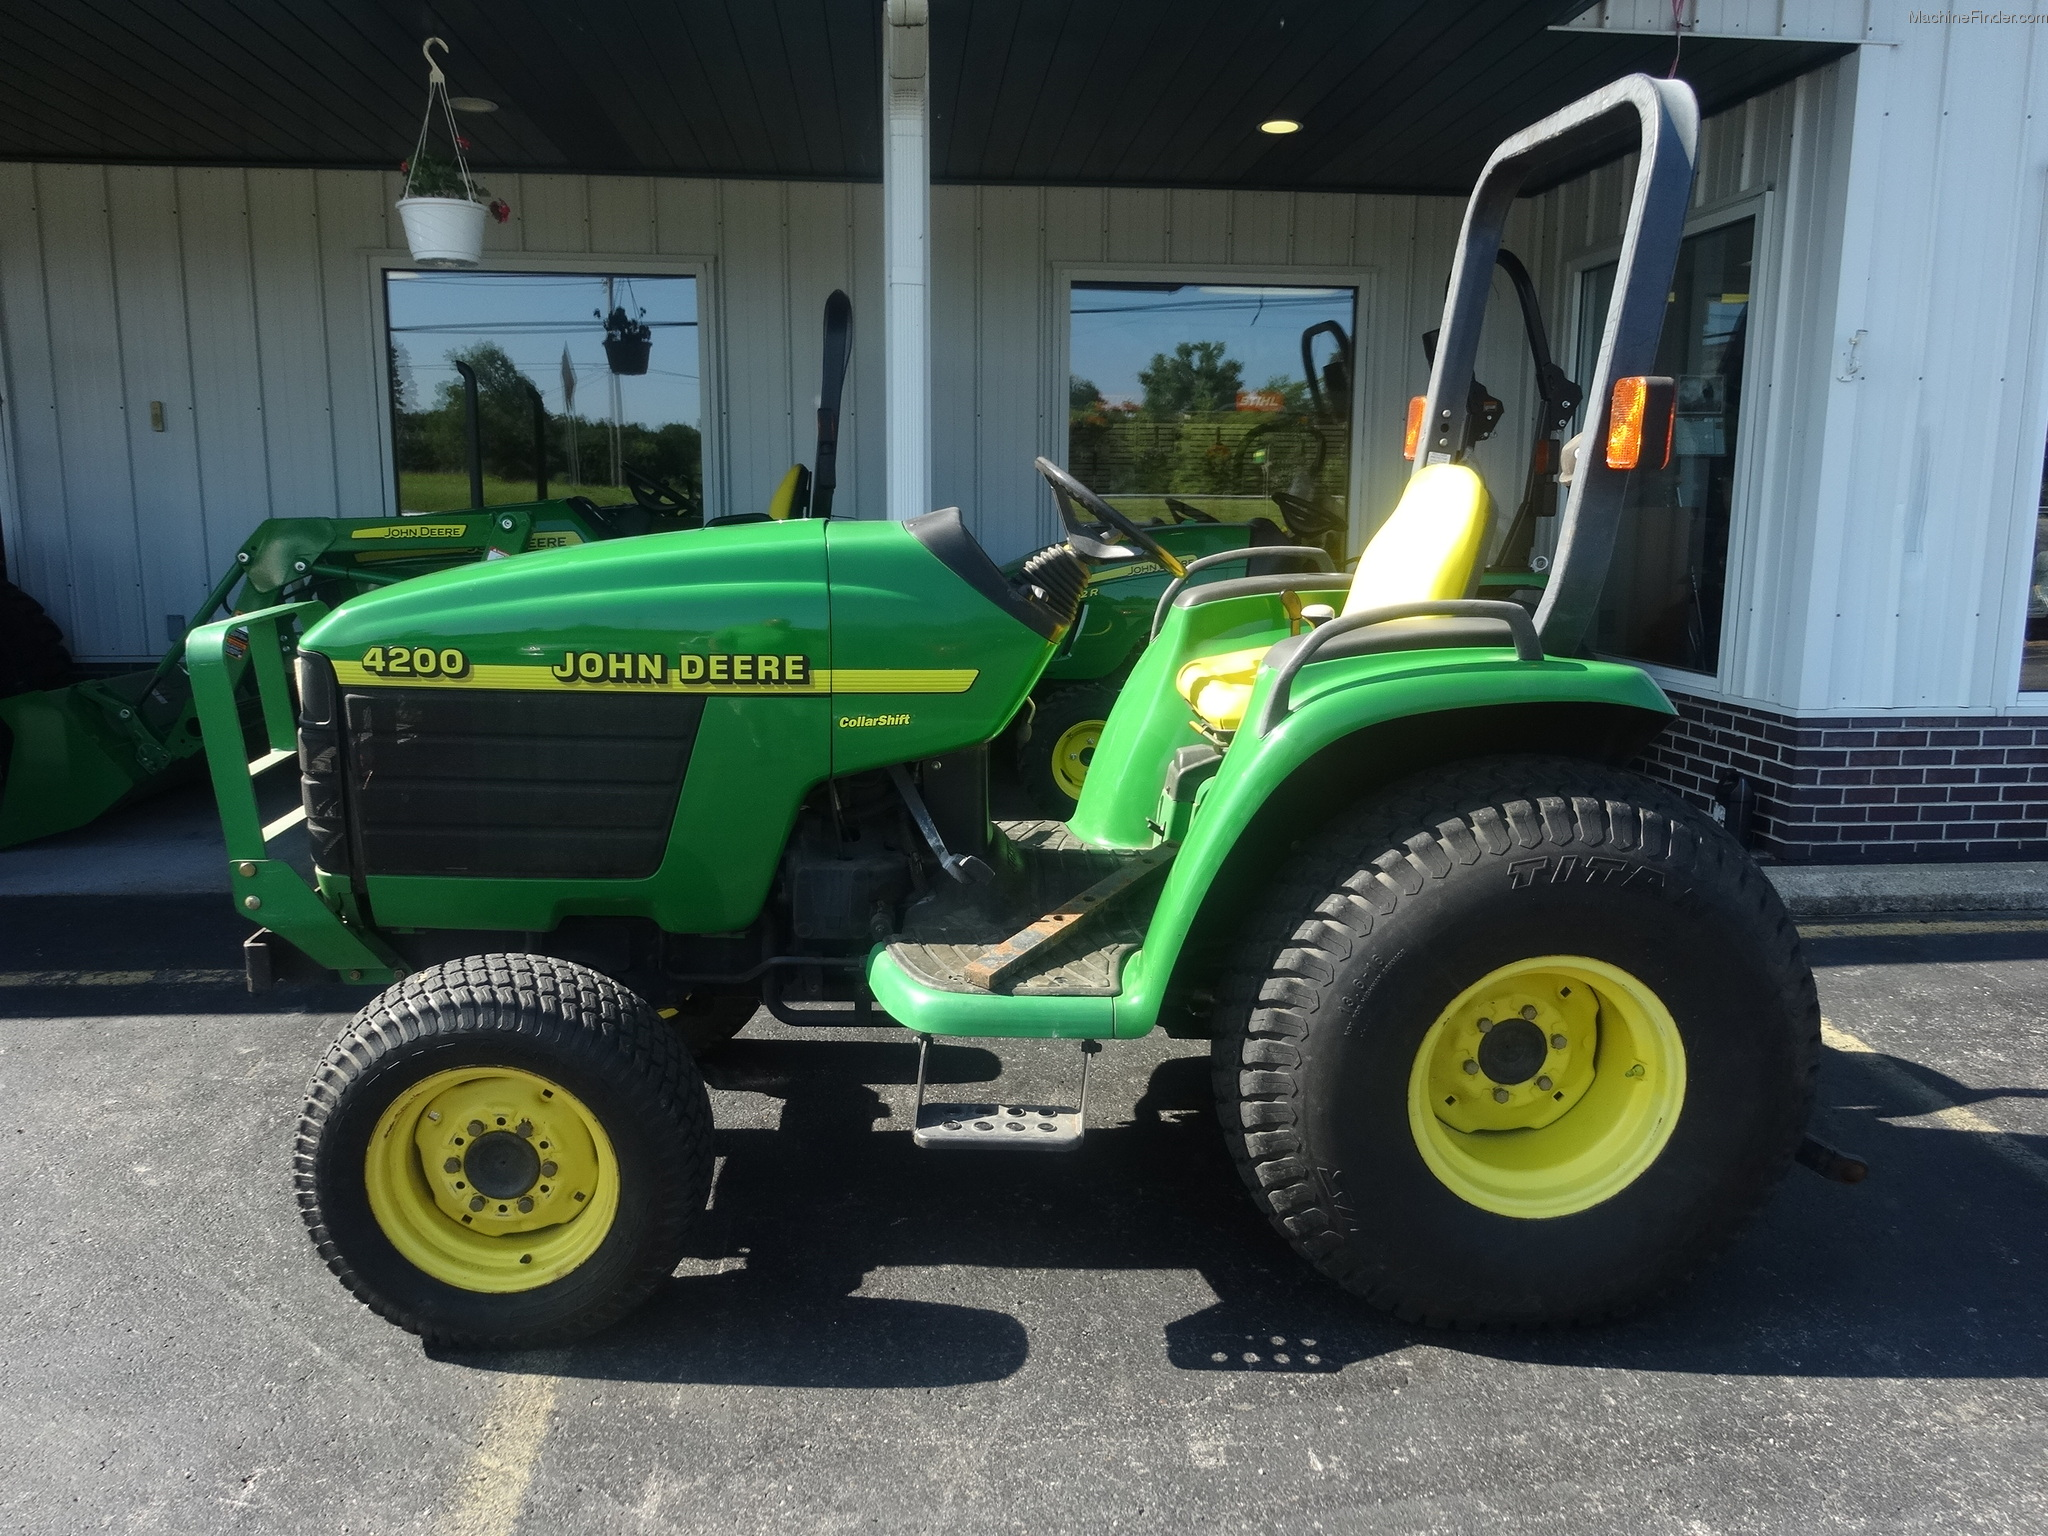 1999 John Deere 4200 Tractors - Compact (1-40hp.) - John ...